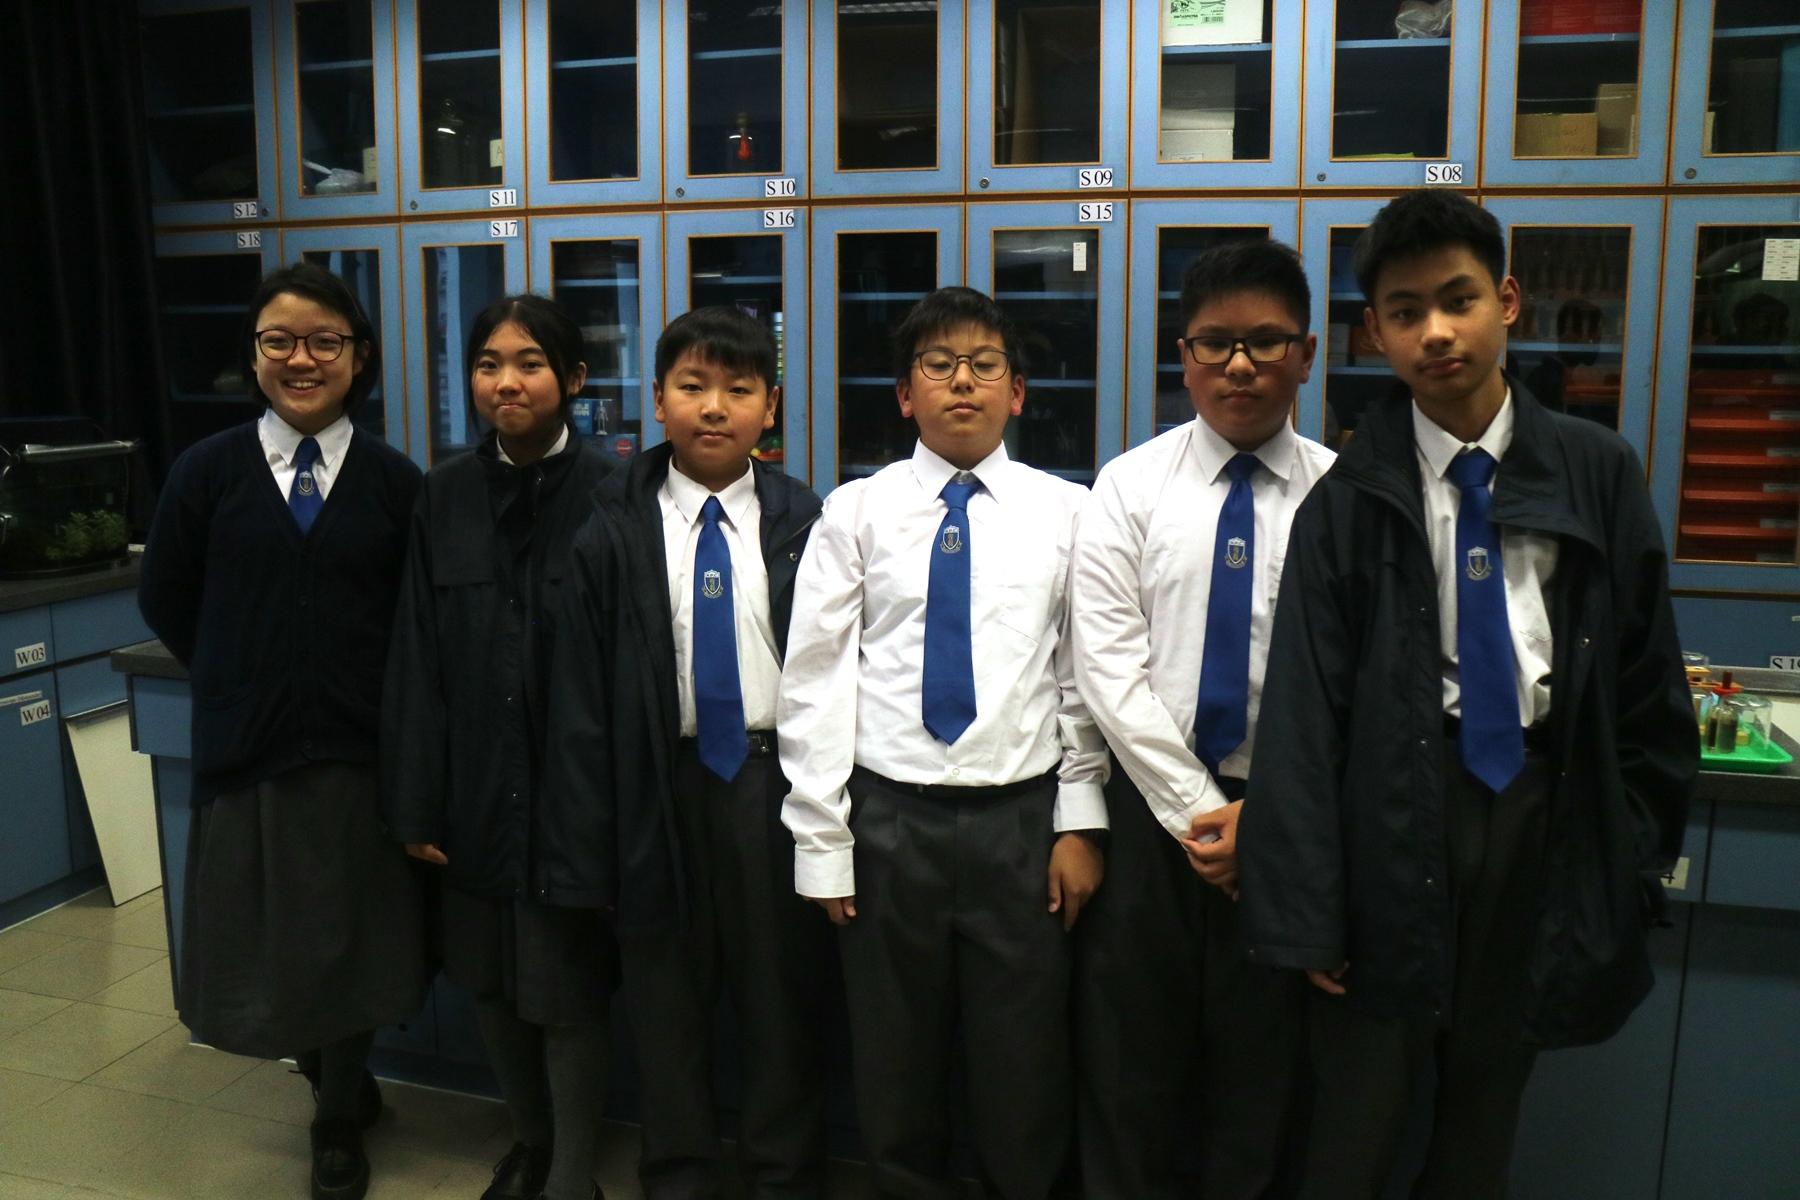 http://npc.edu.hk/sites/default/files/img_8901.jpg